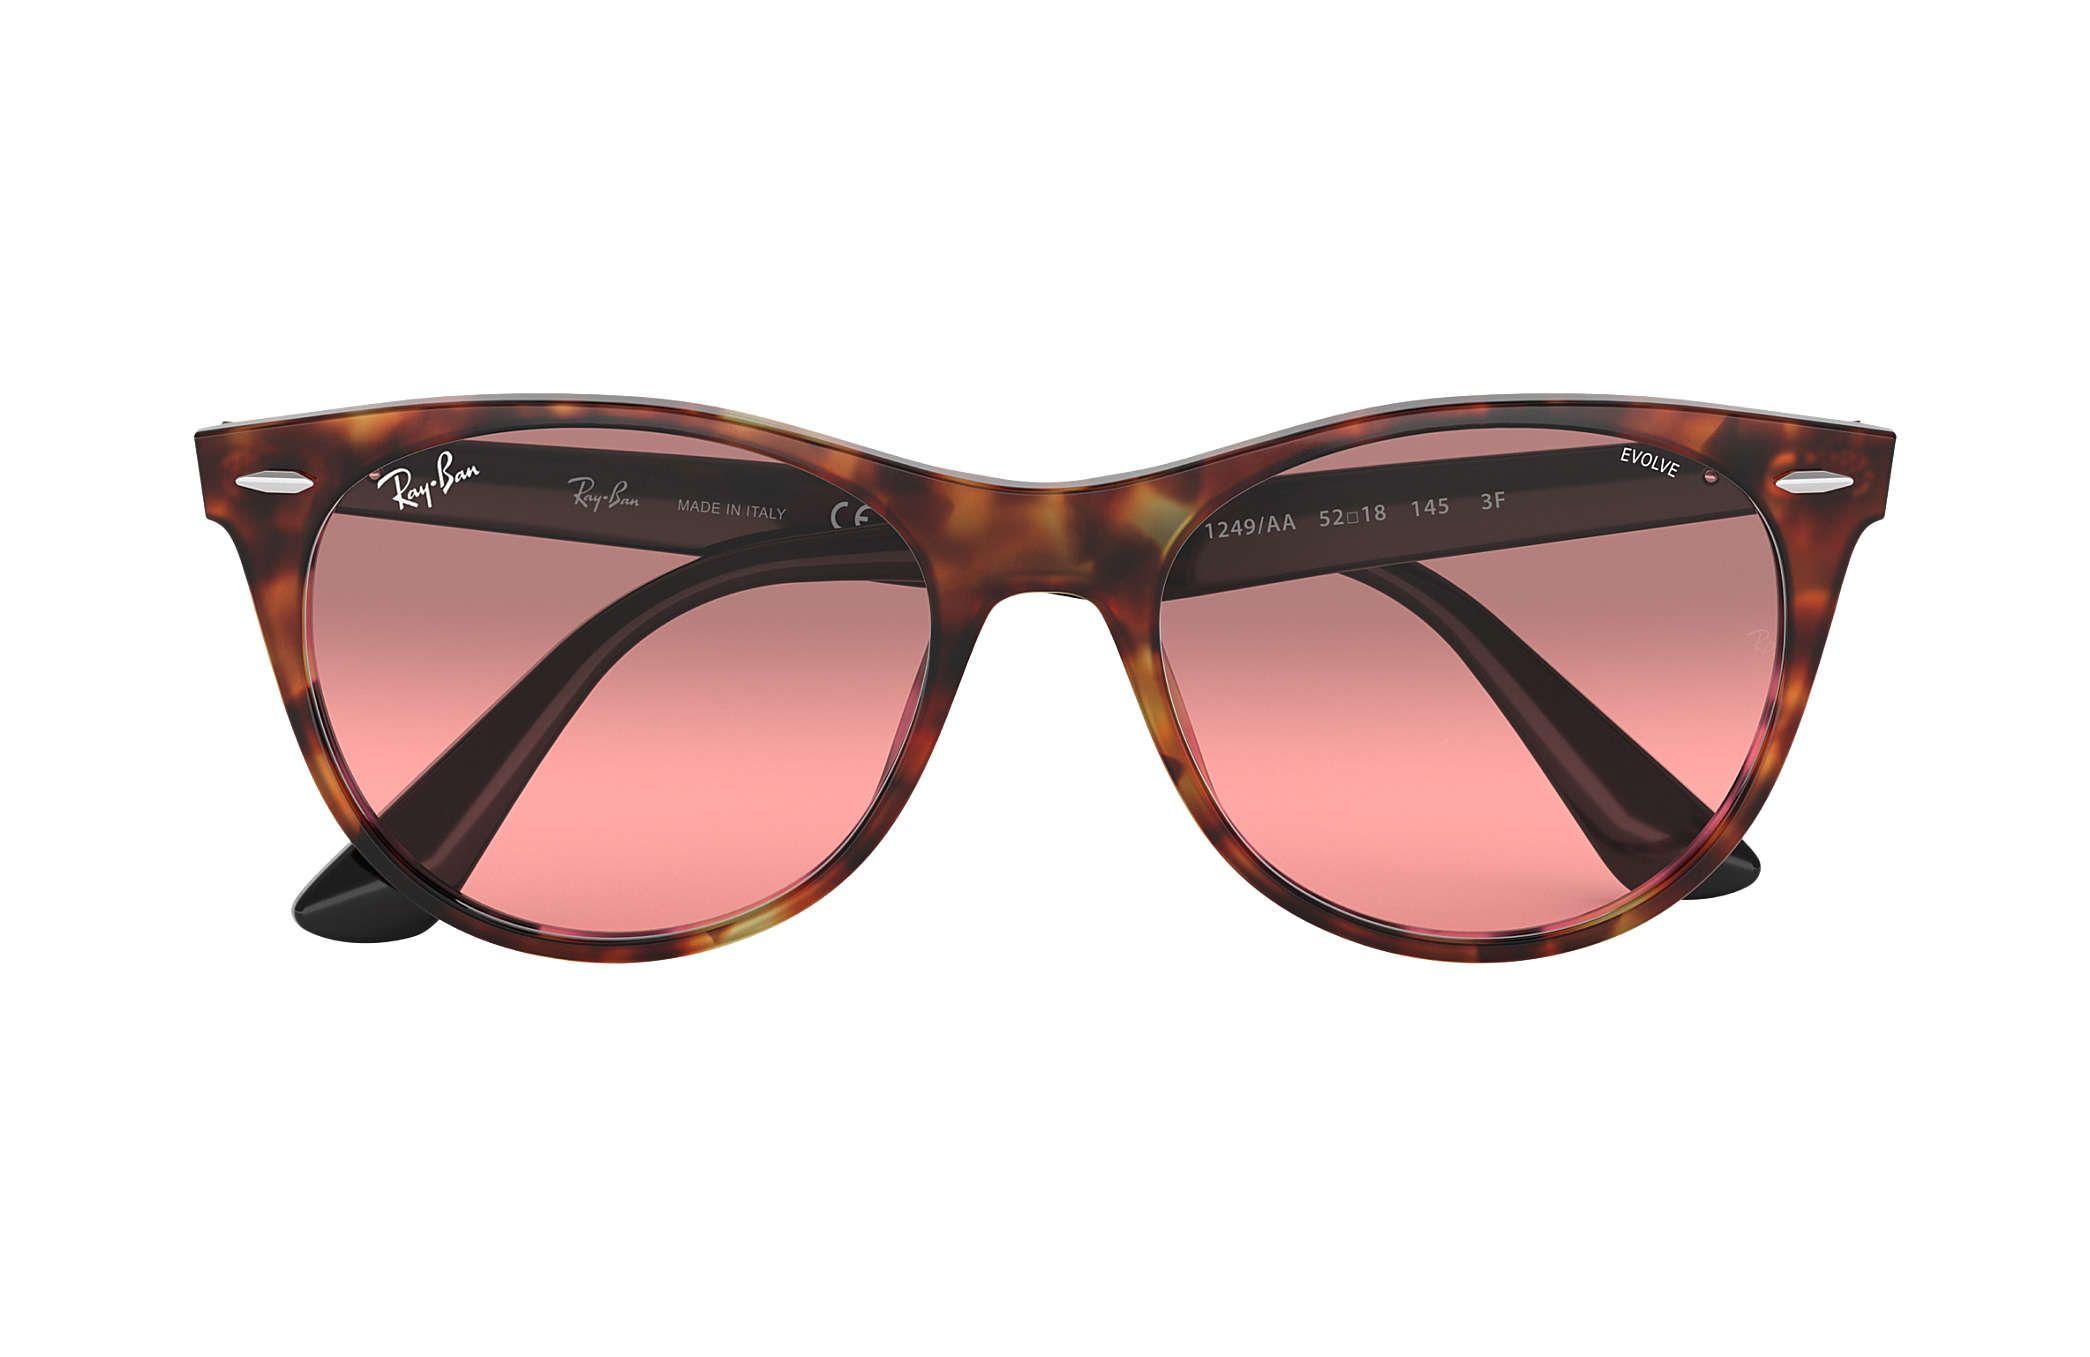 Check Out The Wayfarer Ii Washed Evolve At Ray Ban Com Ray Ban Sunglasses Outlet Rayban Wayfarer Ray Ban Sunglasses